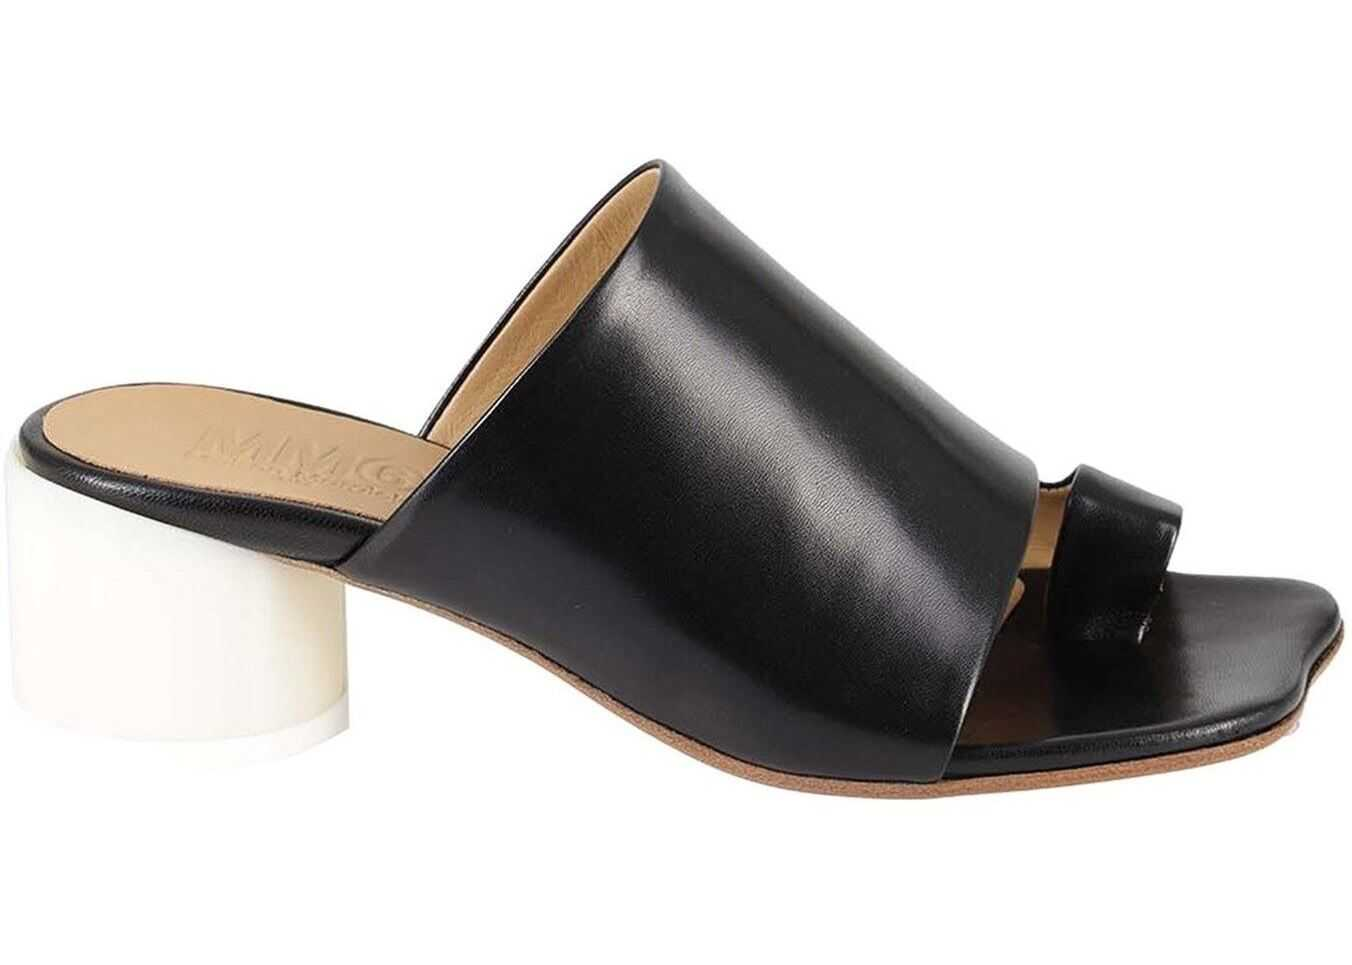 MM6 Maison Margiela Leather Thong Mules In Black S59WP0136PR331T8013 Black imagine b-mall.ro